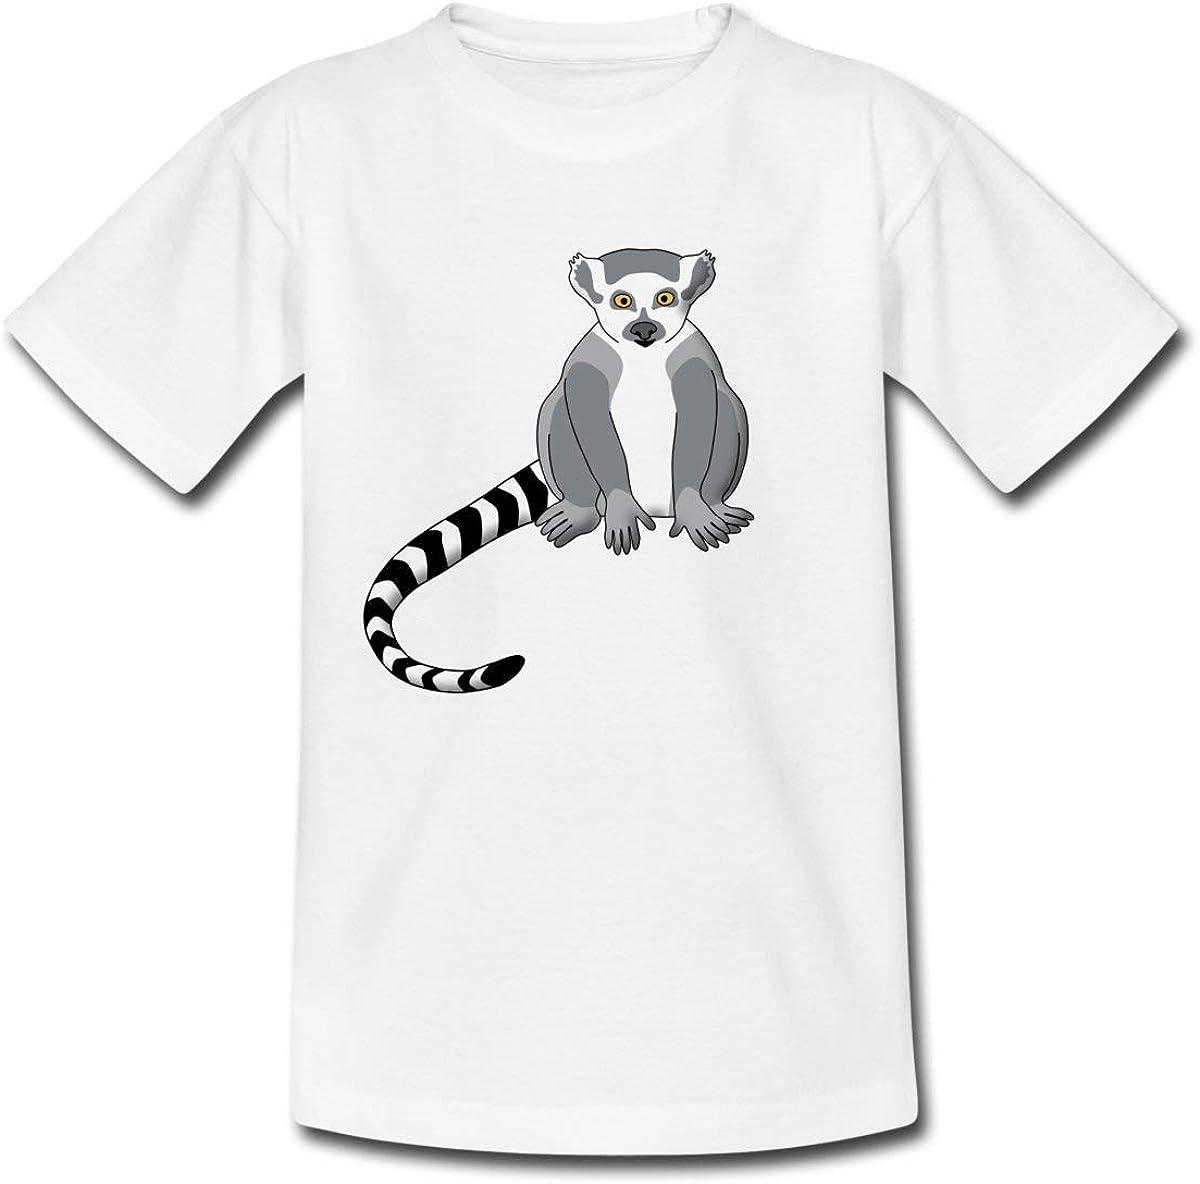 Ring Tailed Lemur Kids T-Shirt